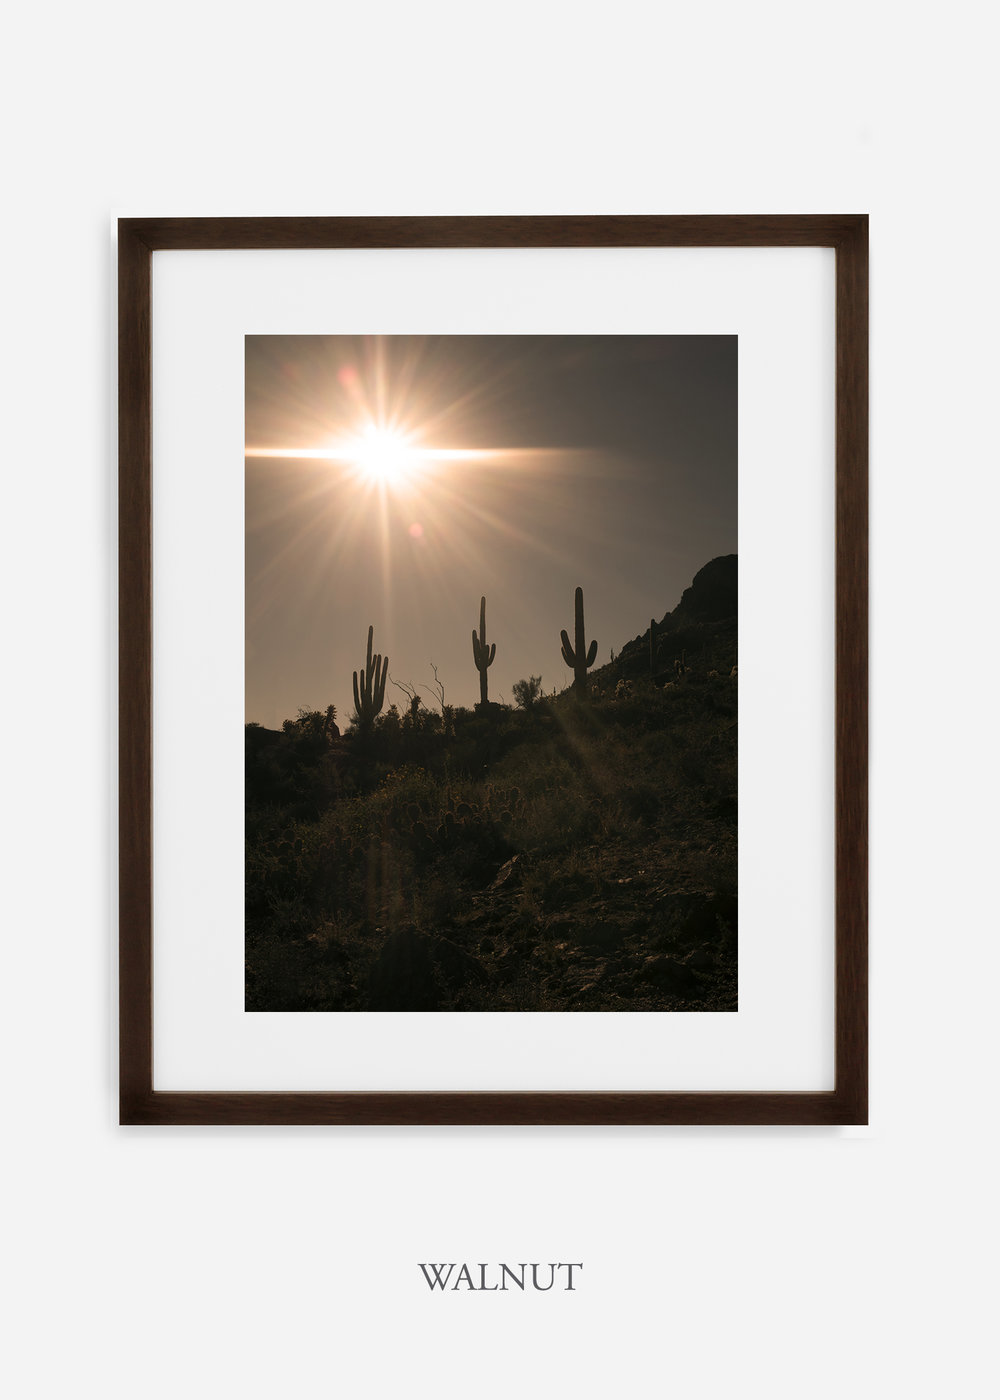 walnutframe-saguaroNo.16-wildercalifornia-art-wallart-cactusprint-homedecor-prints-arizona-botanical-artwork-interiordesign.jpg